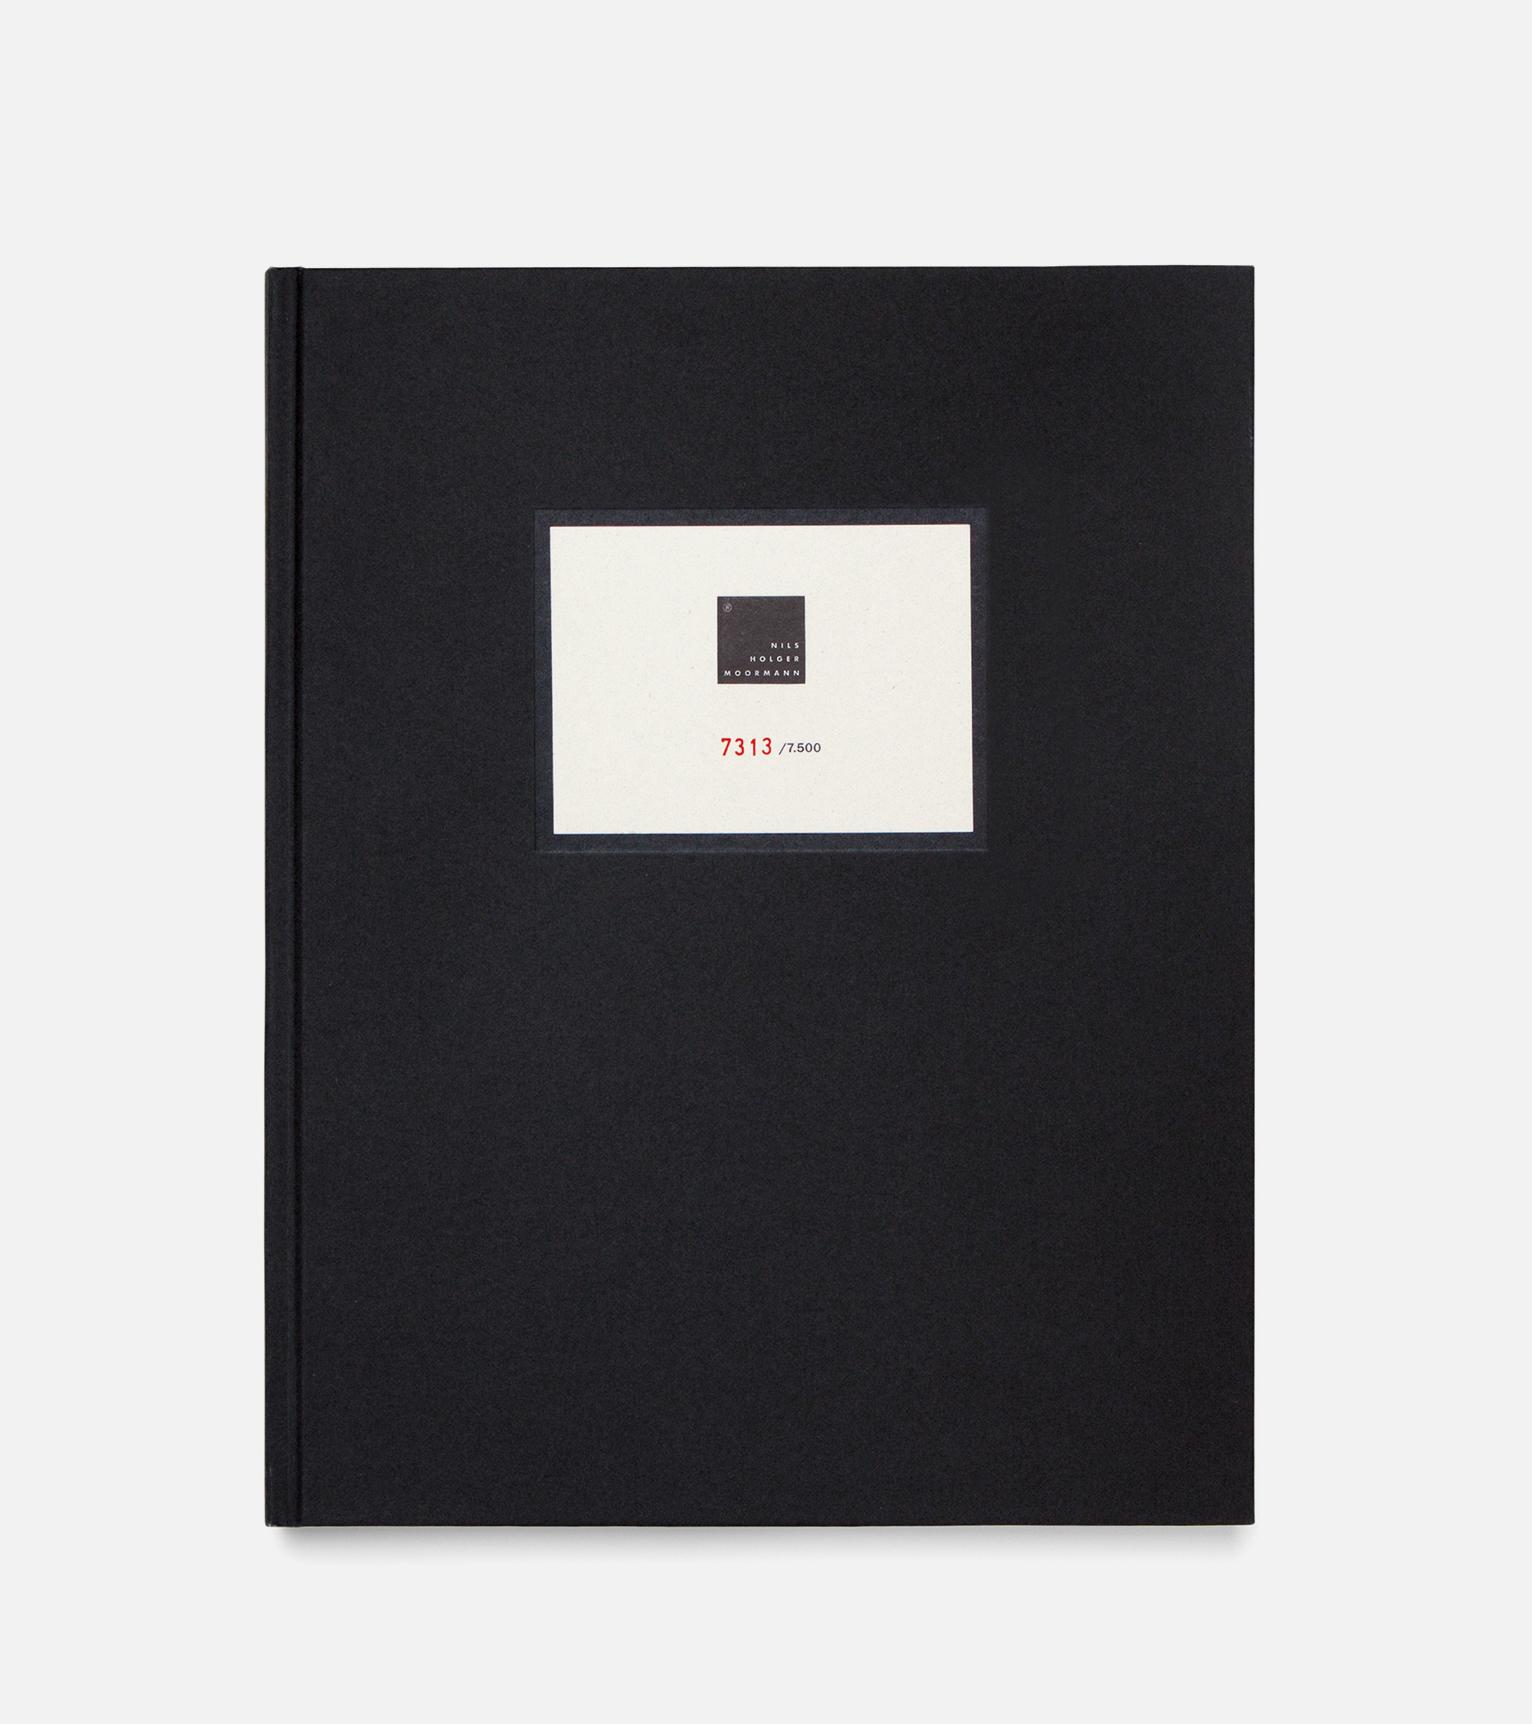 Moormann-Katalog-3-1